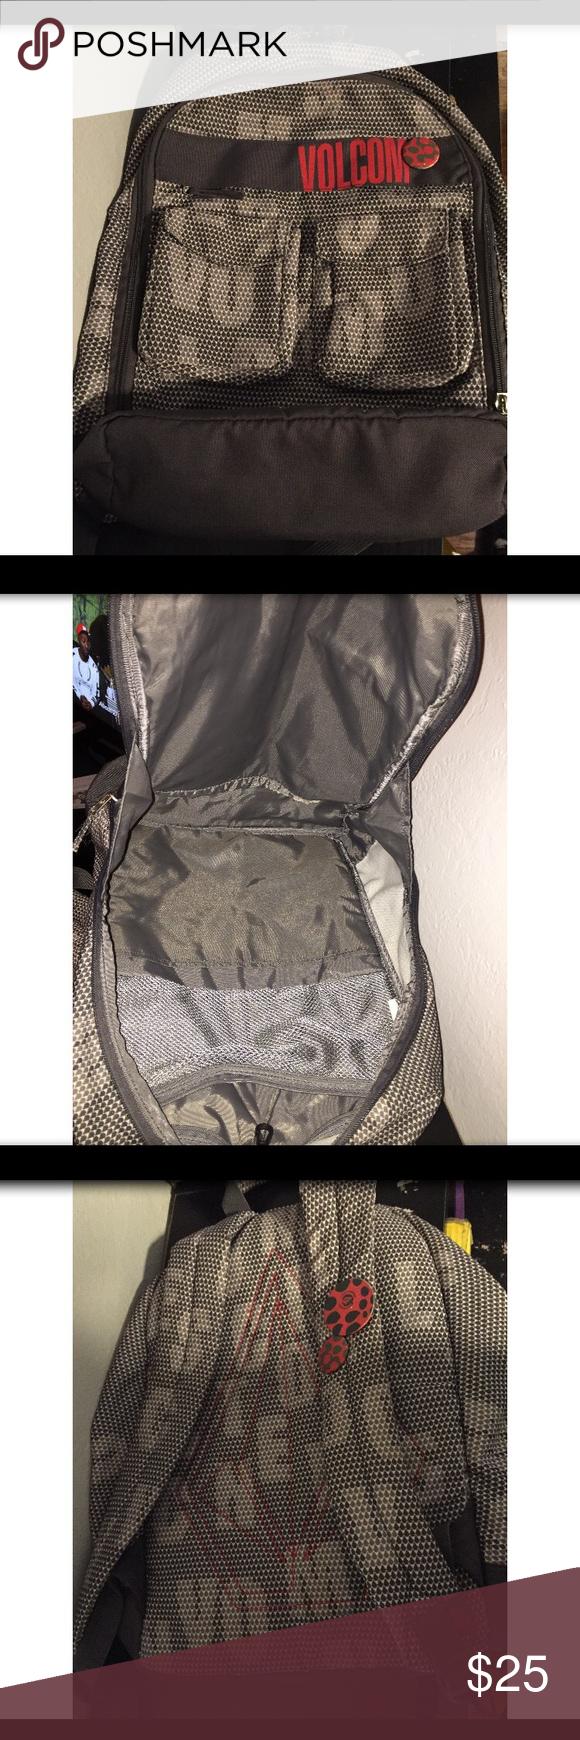 Volcom Backpack NWOT. Never used Volcom Backpack, really cute and lightweight! Volcom Bags Backpacks